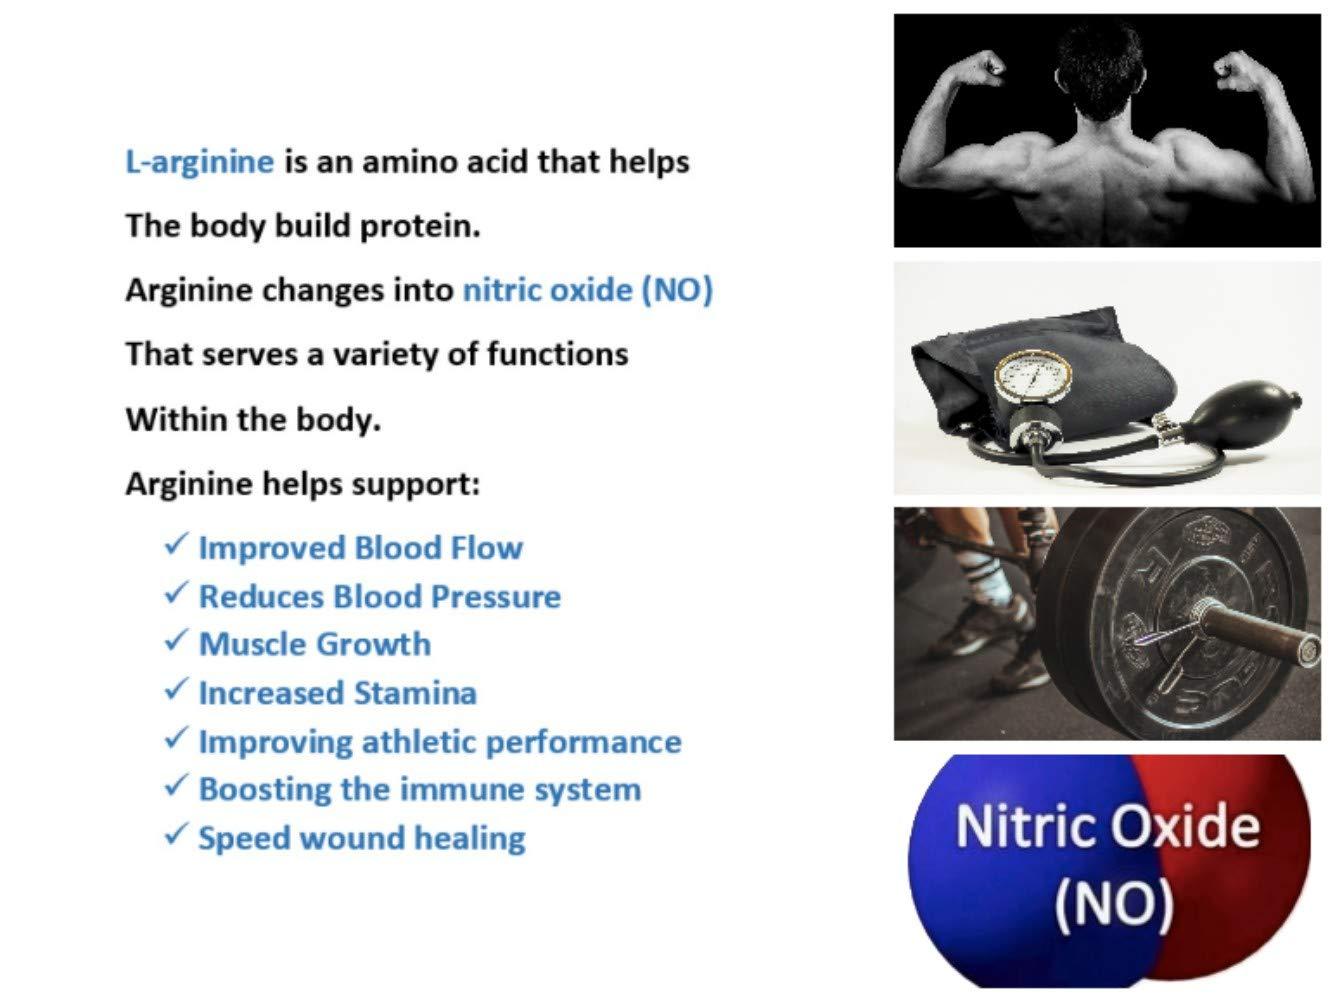 L-arginine Pro, 1 NOW L-arginine Supplement - 5,500mg of L-arginine PLUS 1,100mg L-Citrulline + Vitamins & Minerals for Cardio Health, Blood Pressure, Cholesterol, Energy (Berry, 3 Jars) by L-arginine Pro (Image #9)